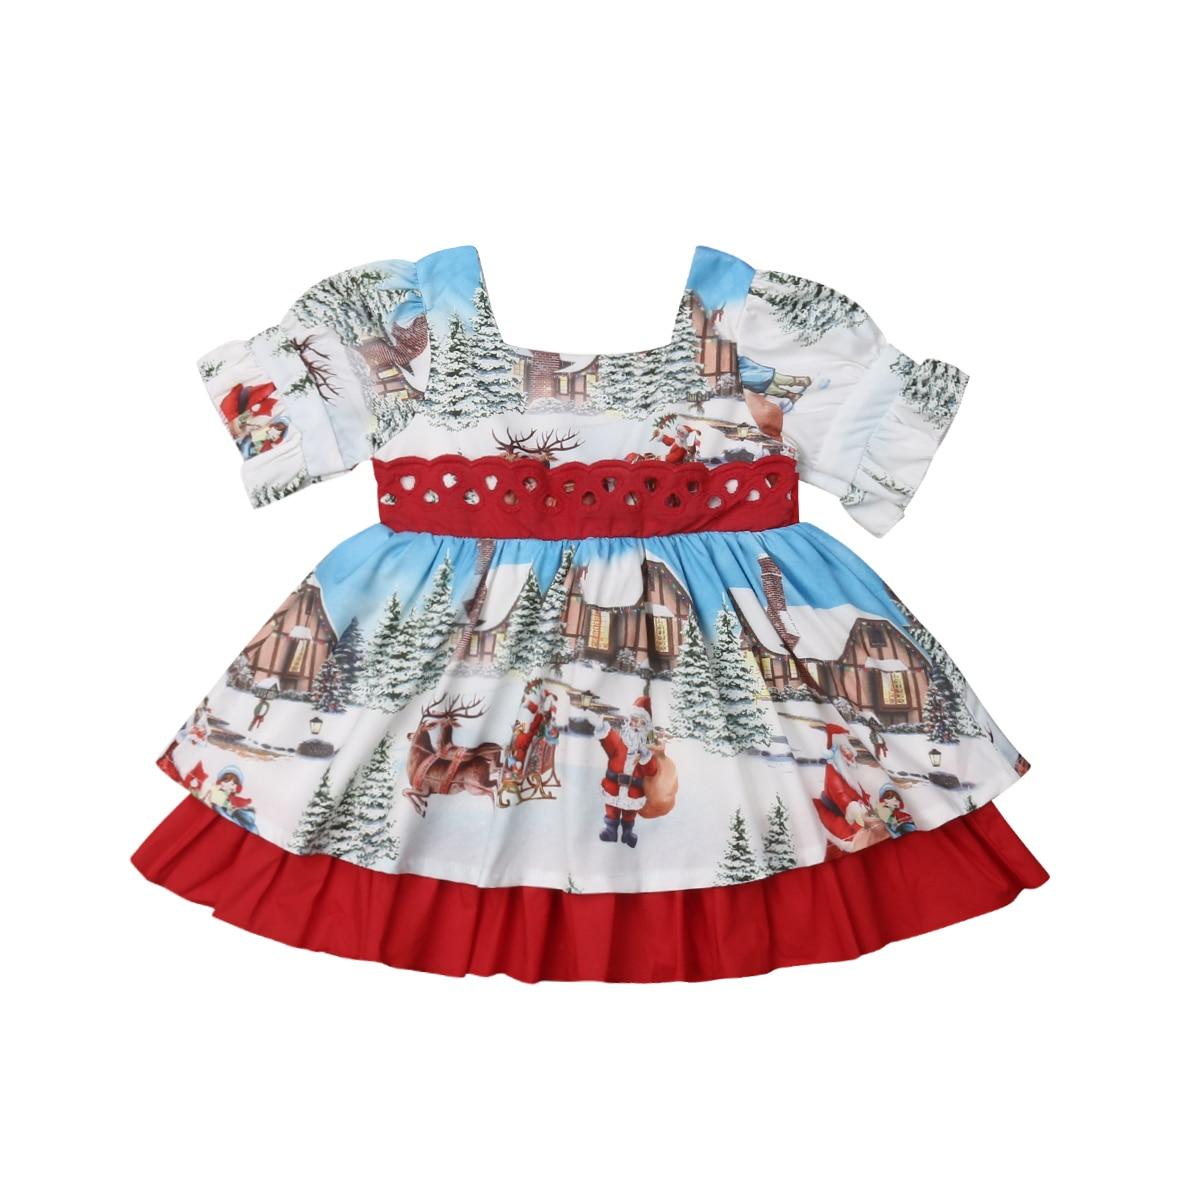 Toddler Christmas Outfit Girl.Toddler Christmas Swing Dress